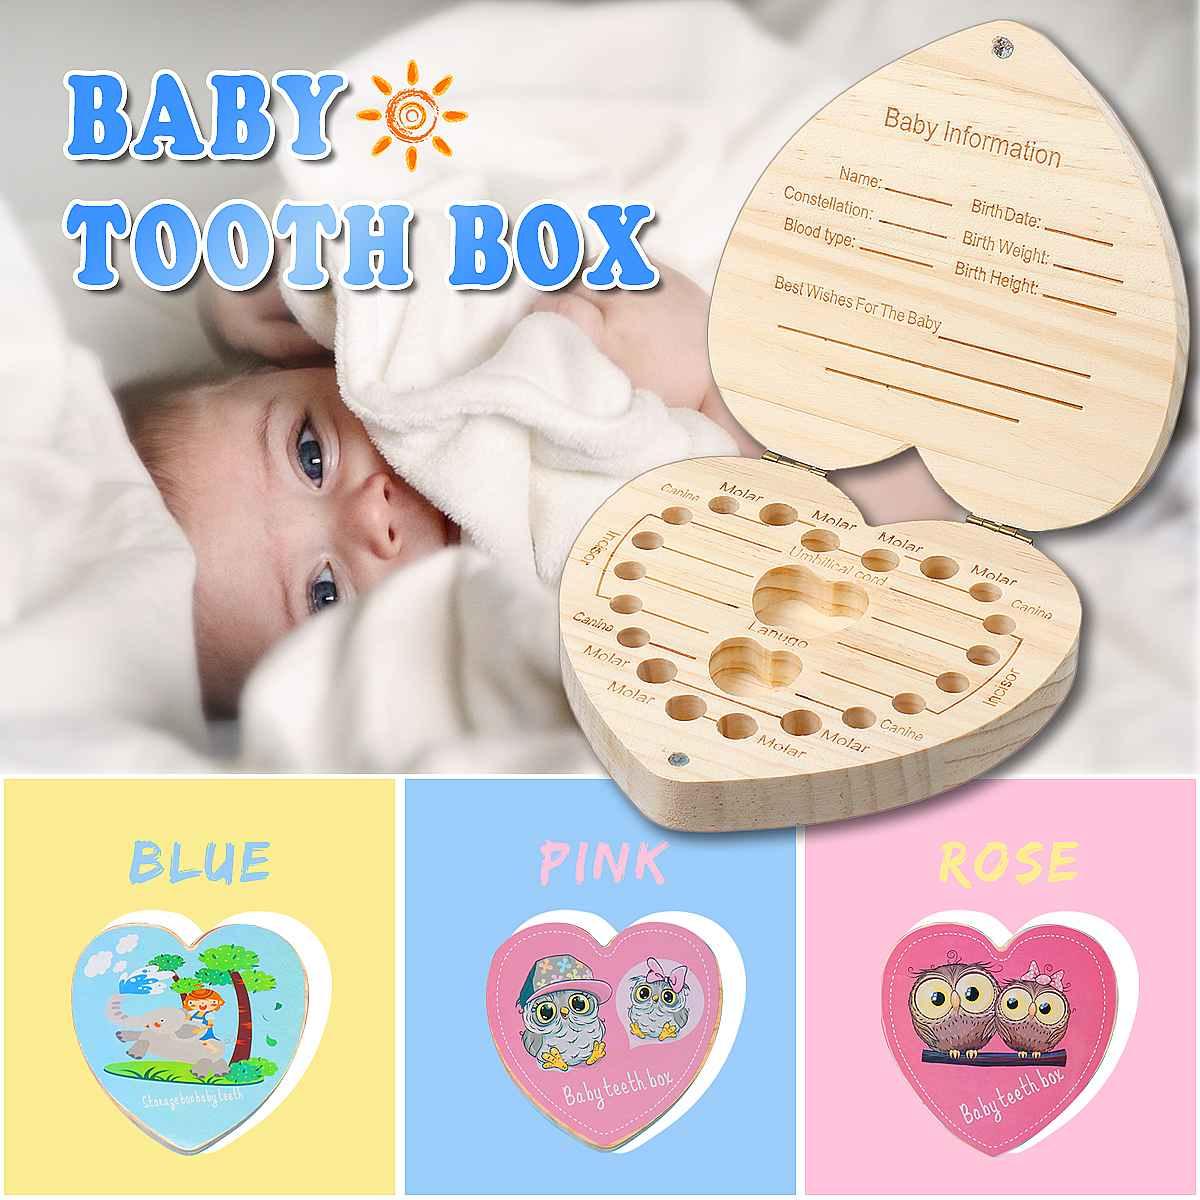 Wooden Kids Baby Tooth Box Organizer Milk Teeth Wood Storage Box Boy Girl Save Teeth First Holder Keepsake Baby Souvenirs Gift